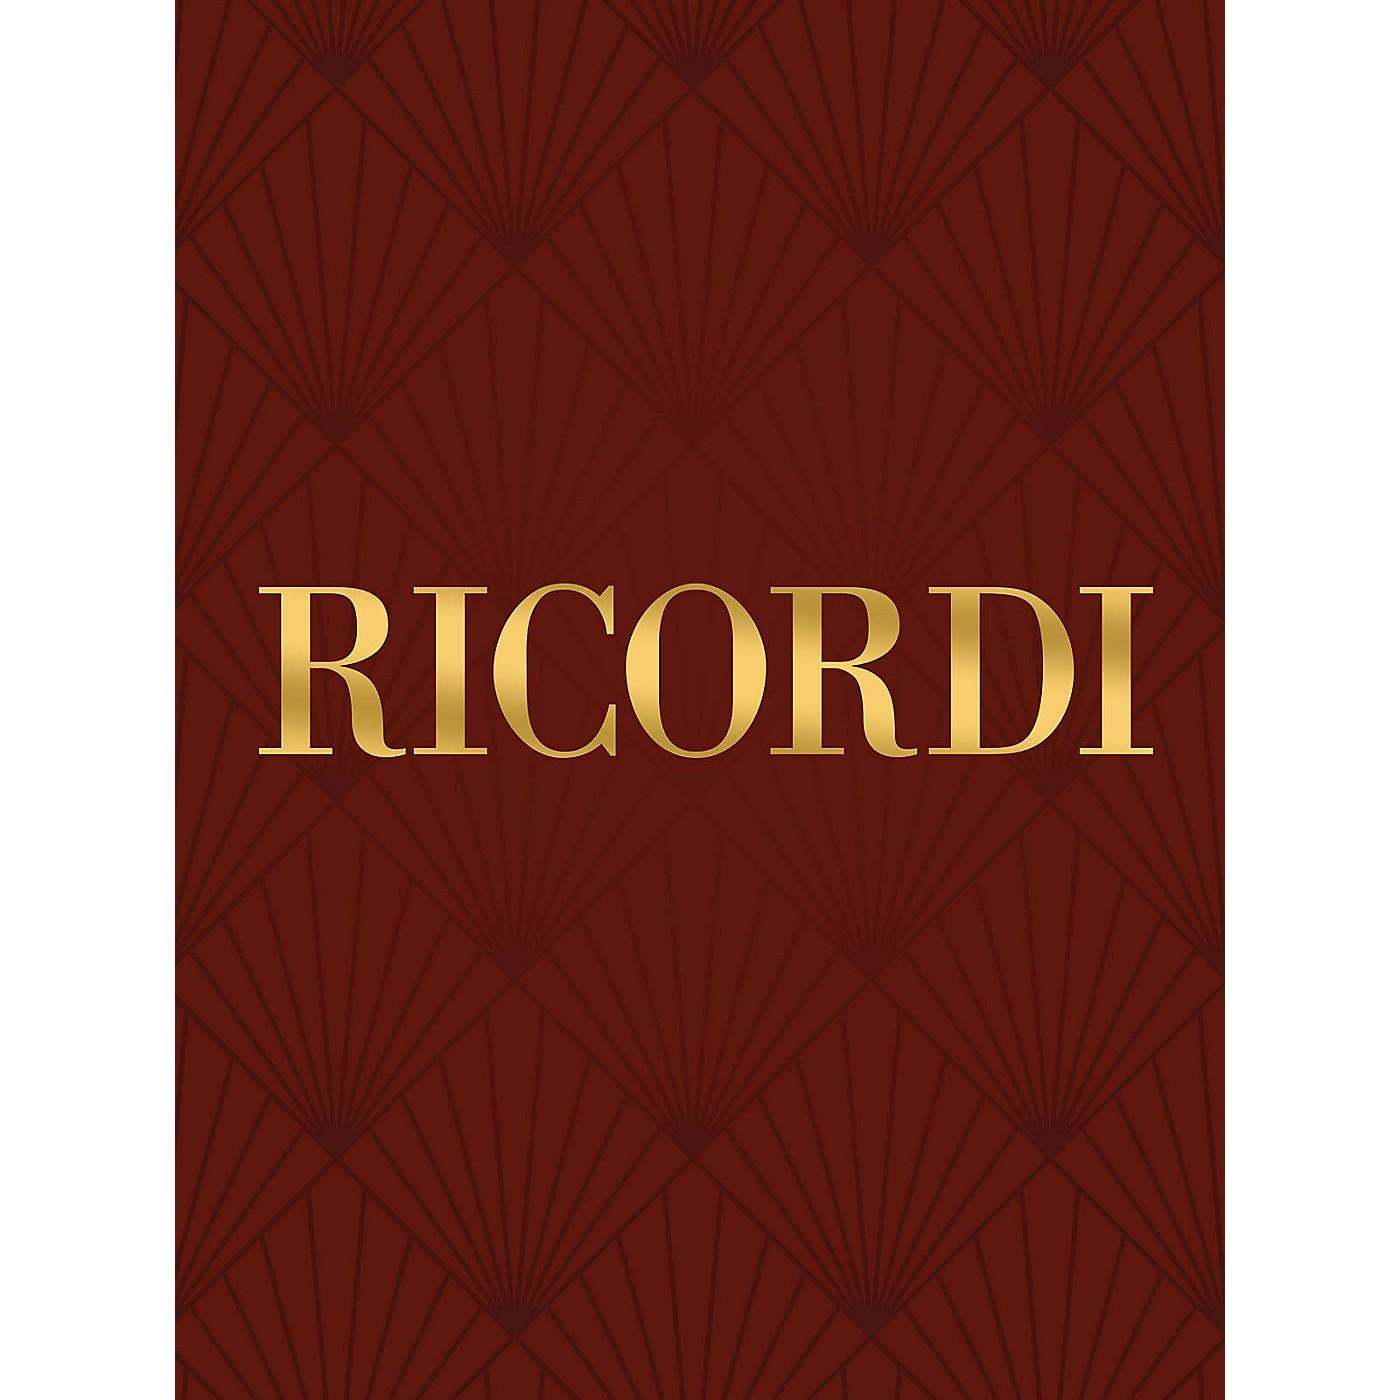 Ricordi Kyrie RV587 (Vocal Score) Vocal Score Composed by Antonio Vivaldi Edited by Vilmos Lesko thumbnail